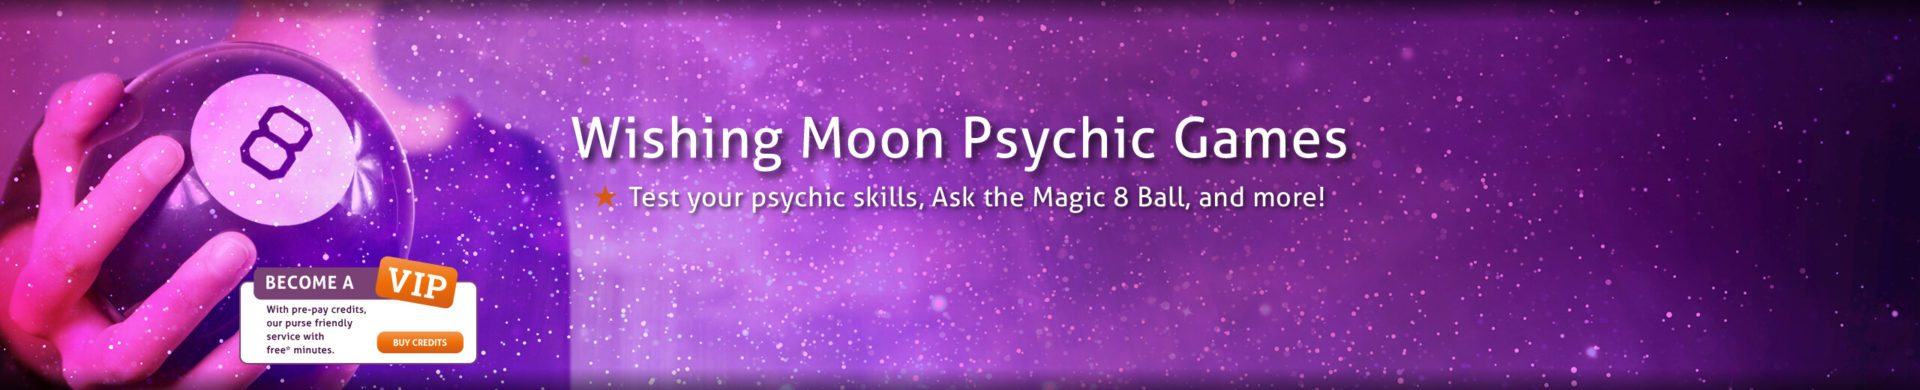 psychic games